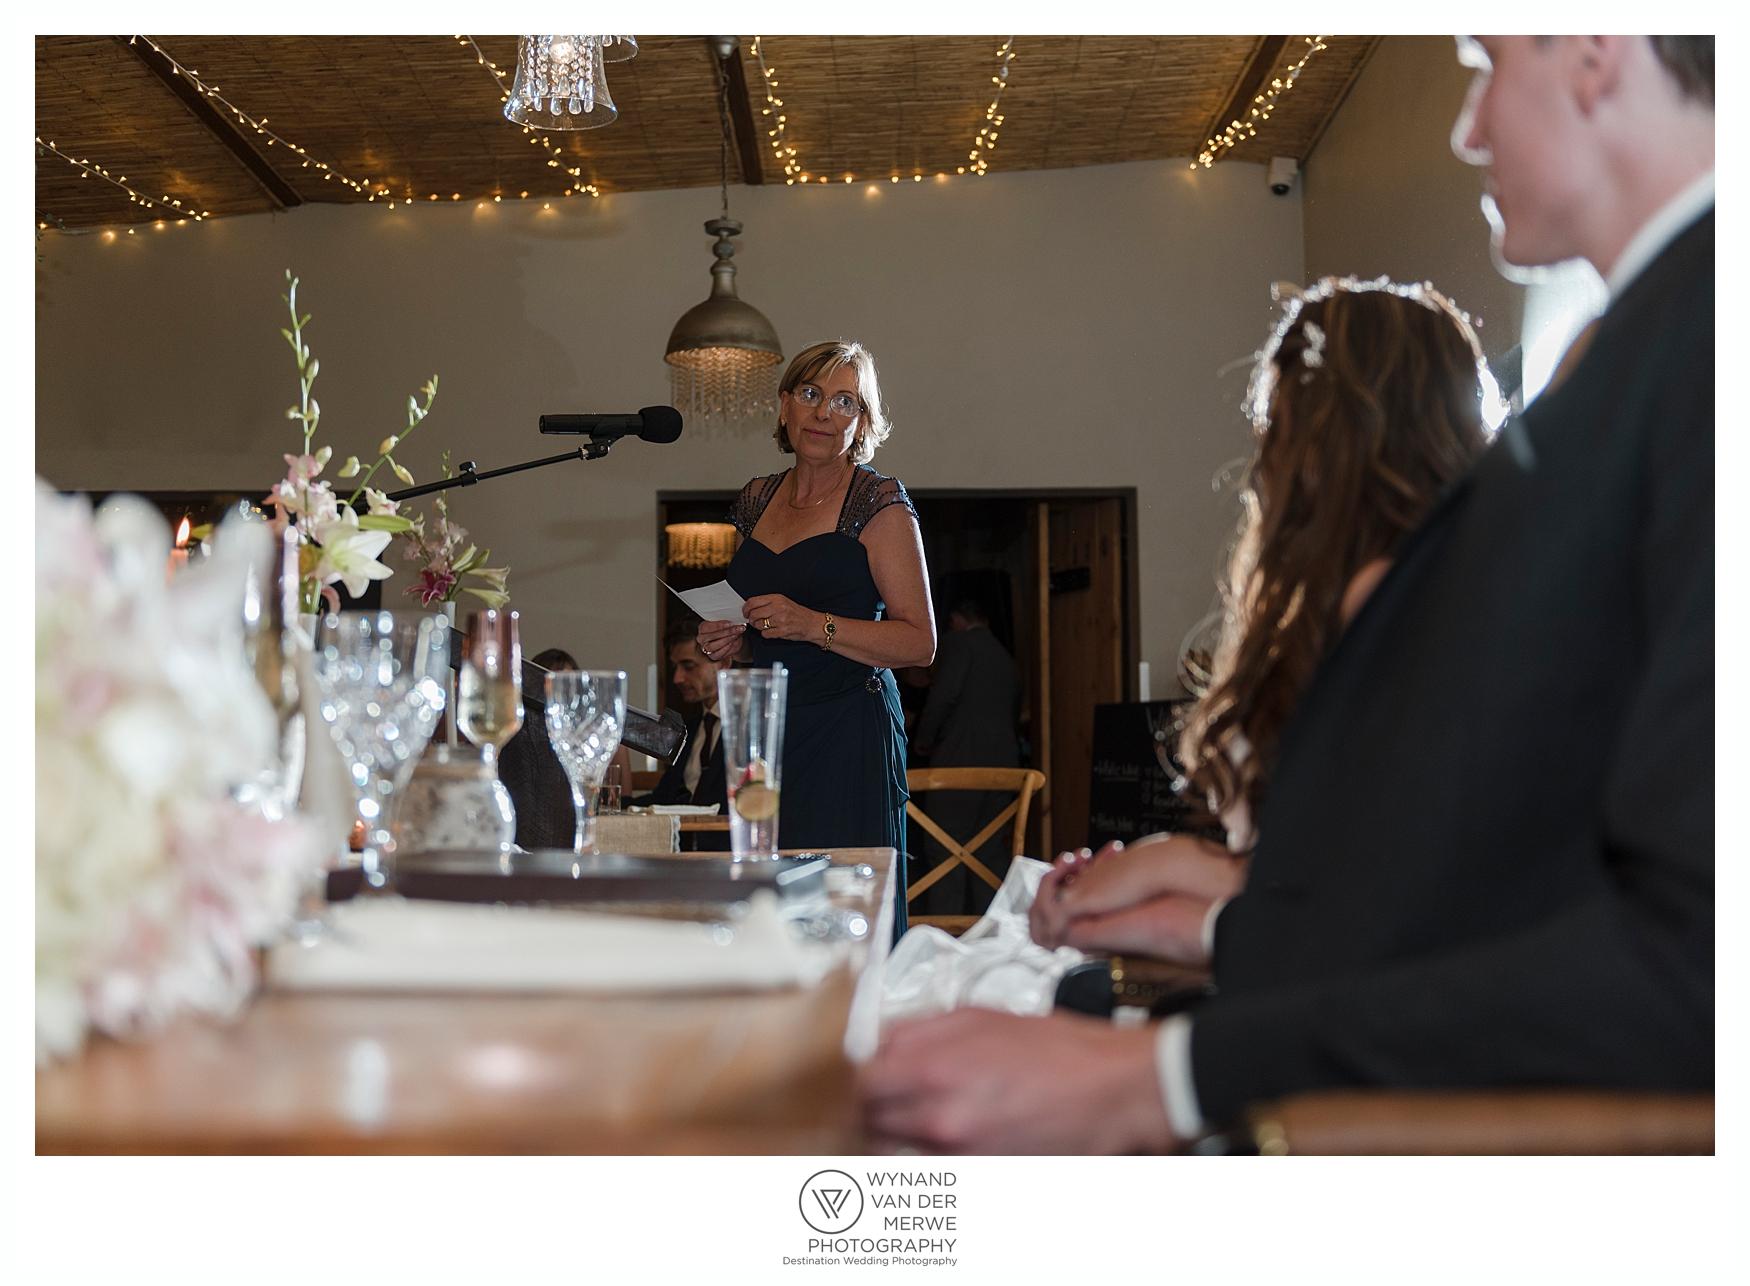 Wynandvandermerwe ryan natalia wedding photography cradle valley guesthouse gauteng-613.jpg